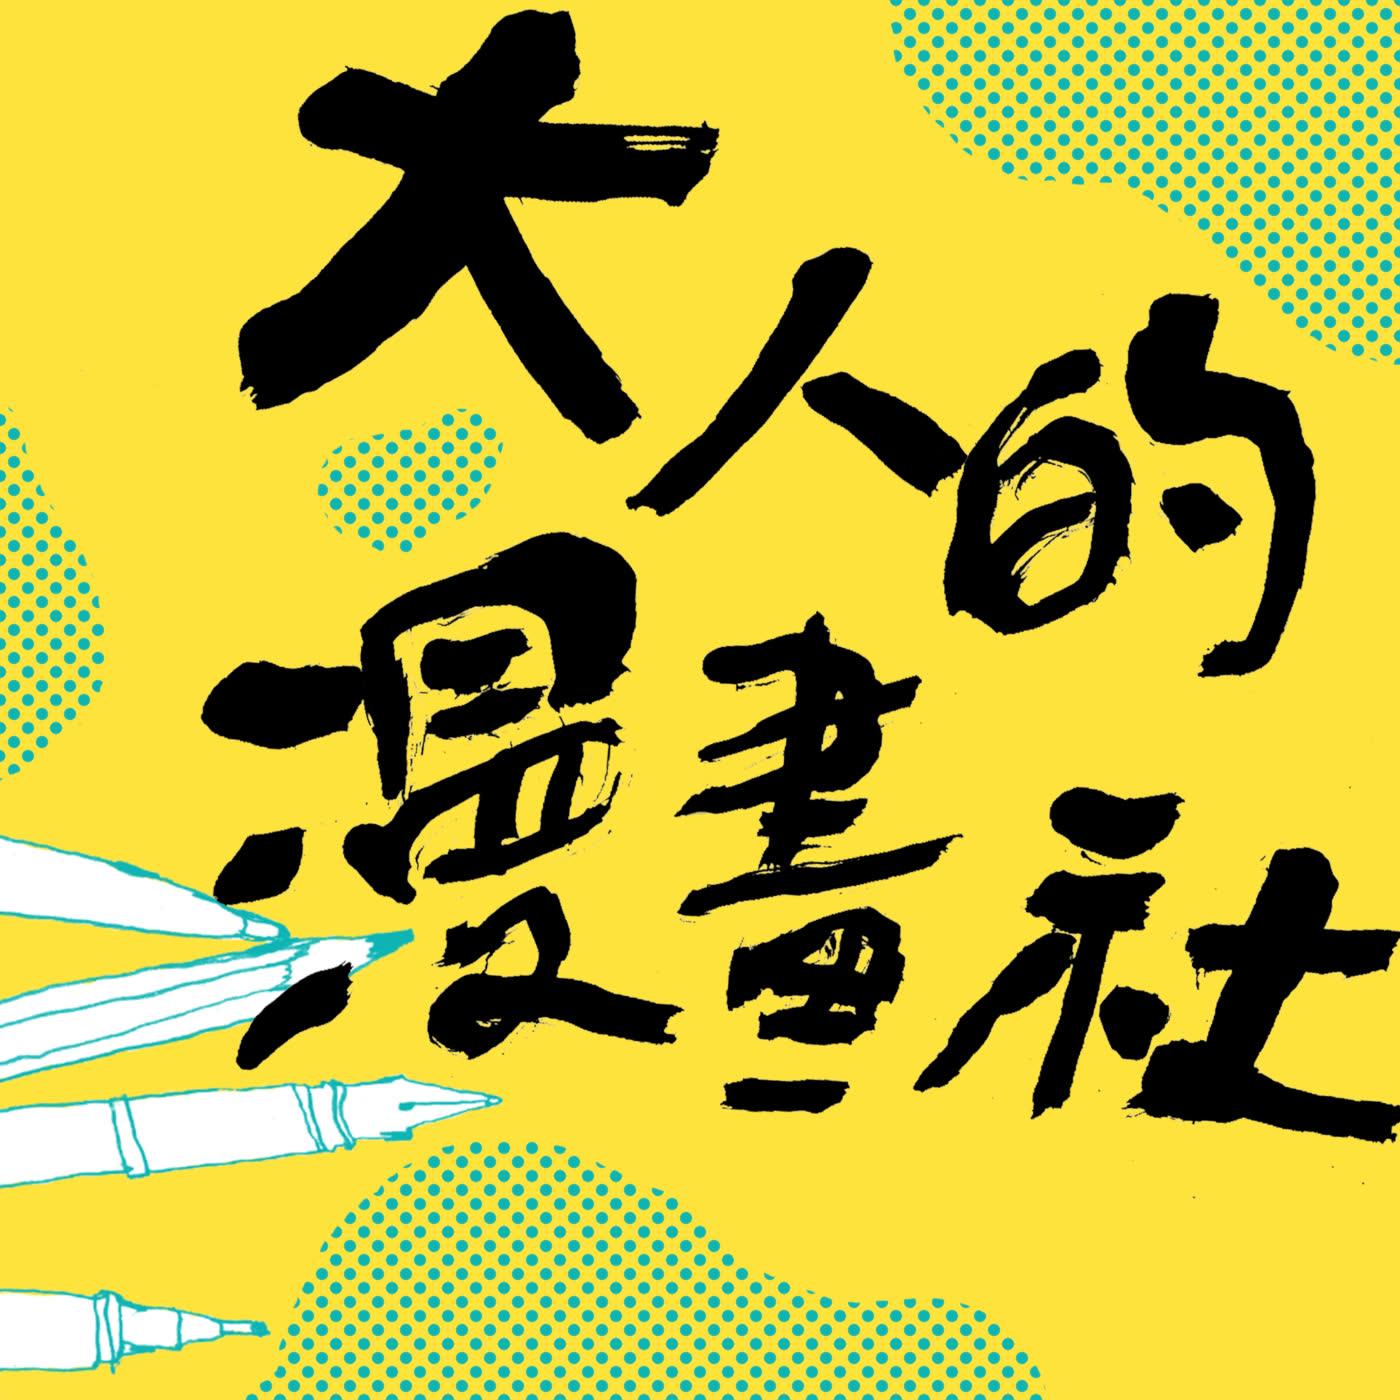 EP7.5【編輯報品】讓我好好說完《無罪之聲》好嗎?!面對書店採購之漫畫編輯小紅的生存之道